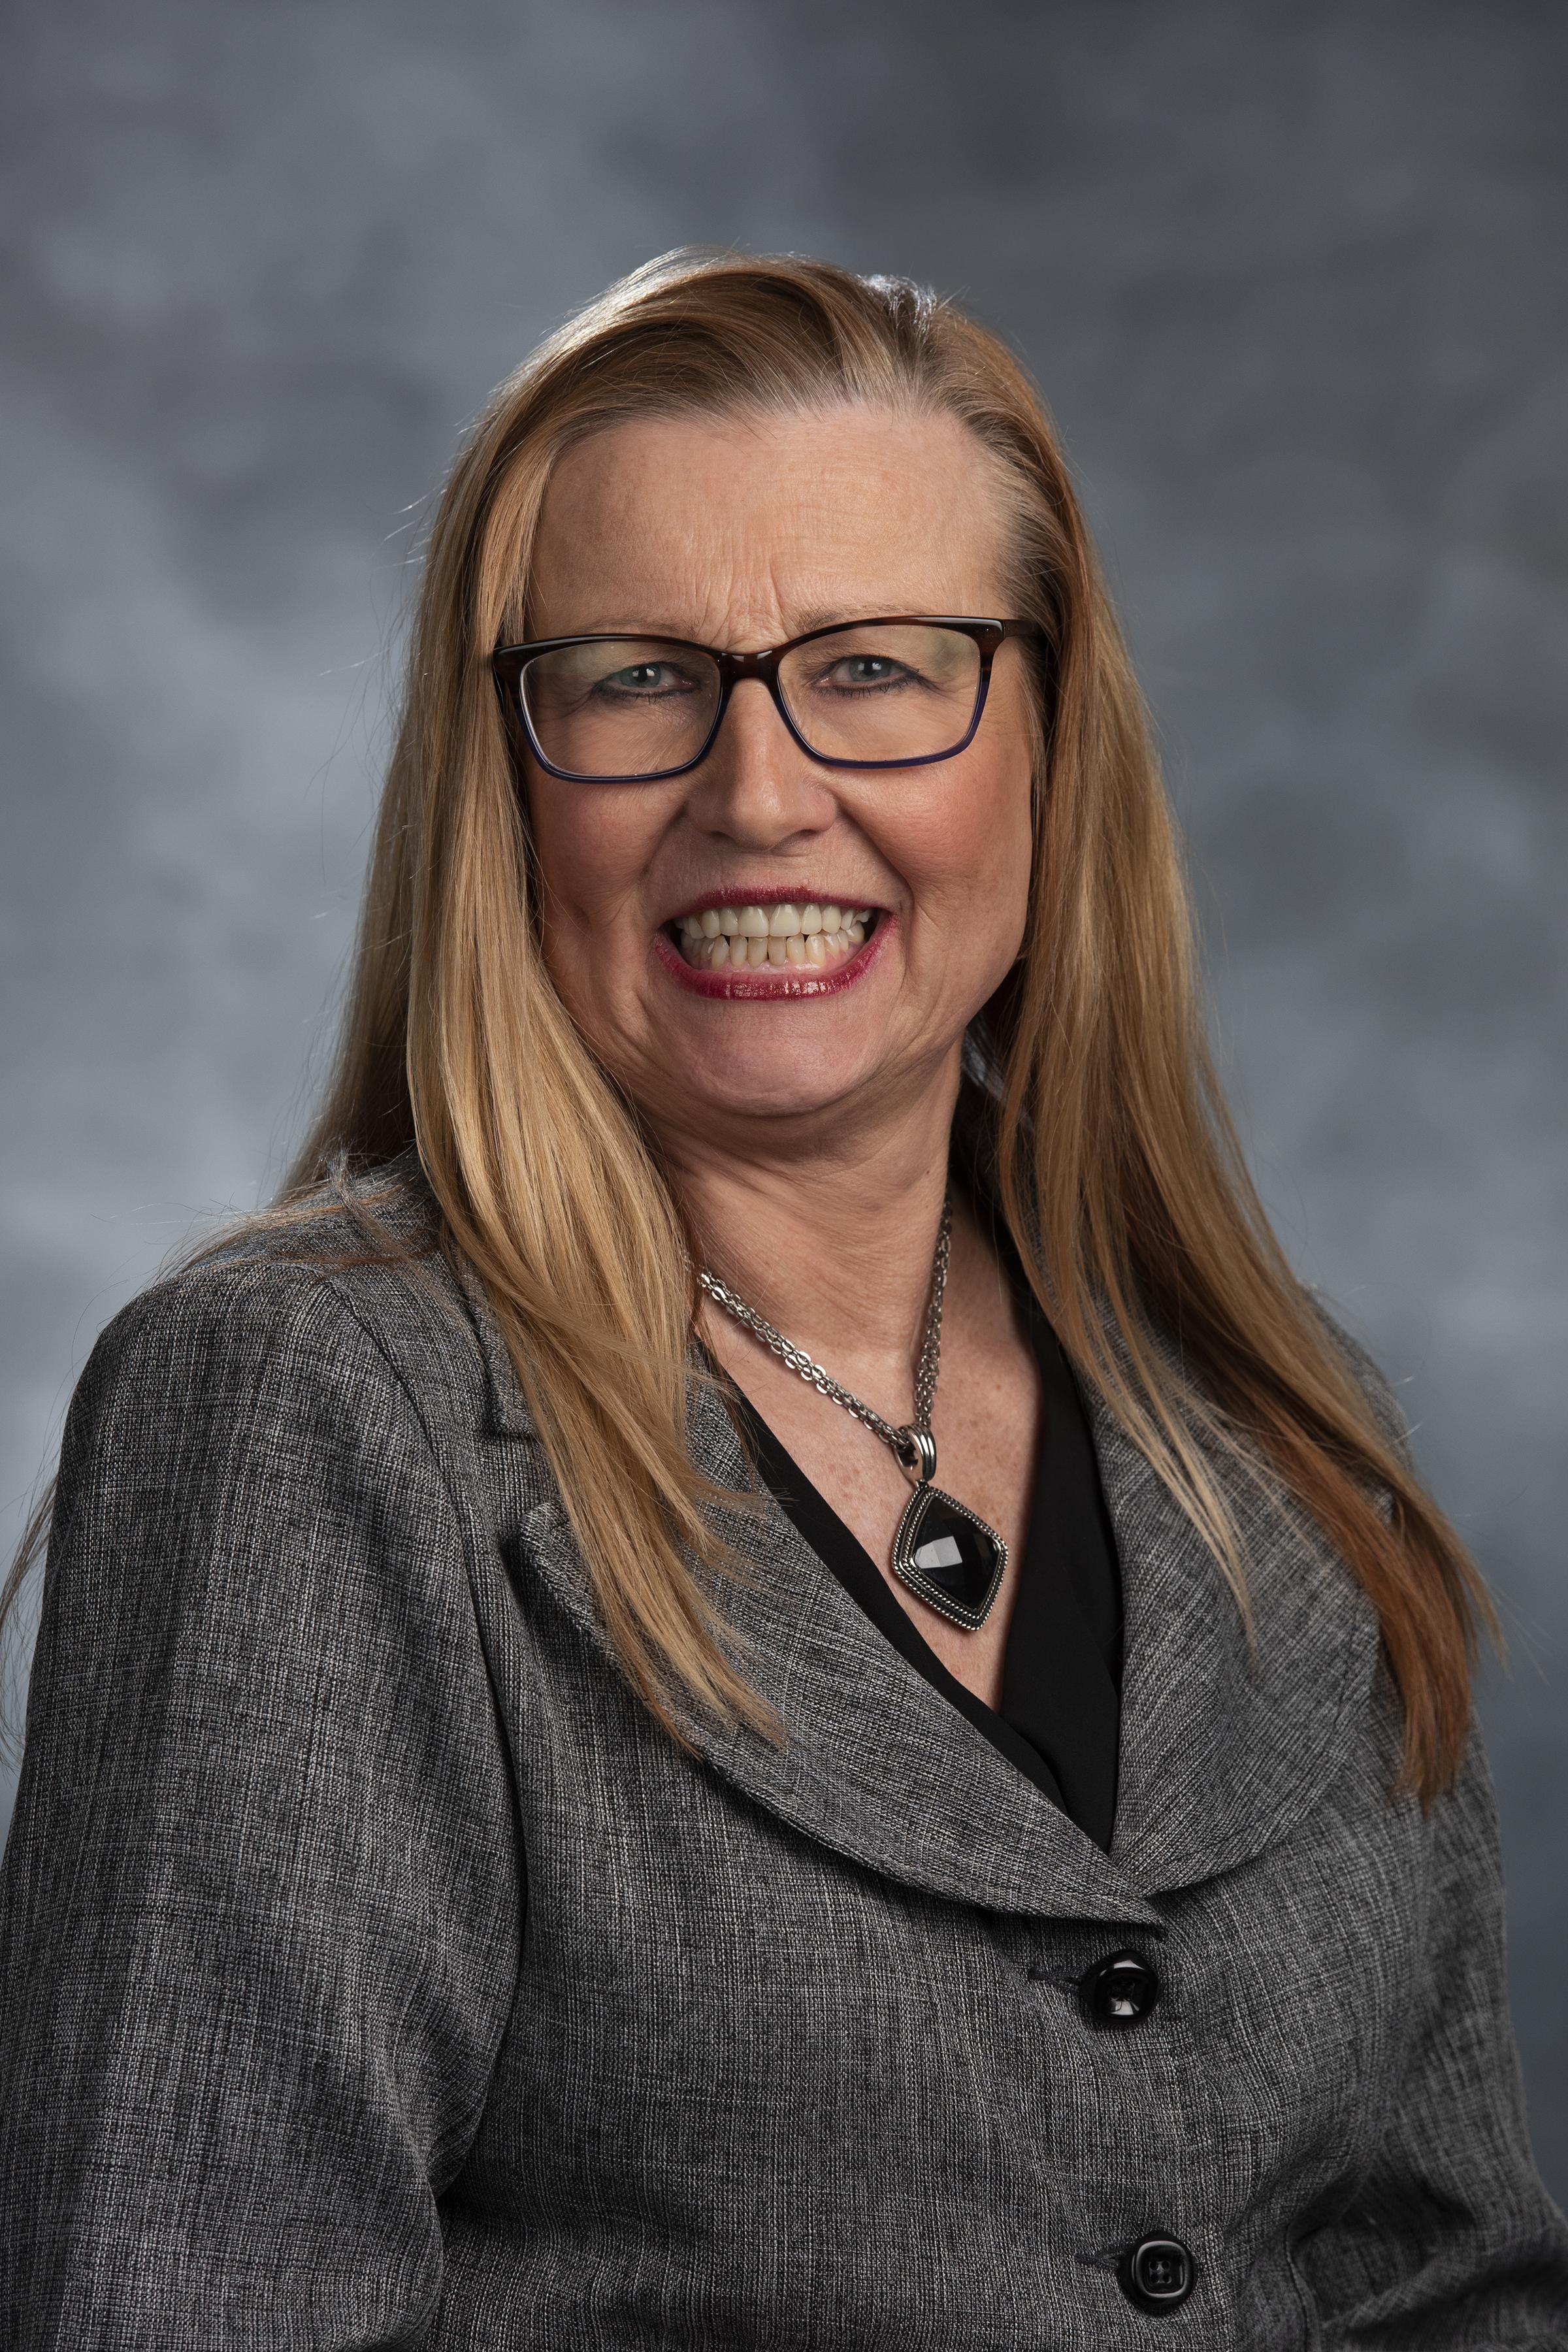 SuzanneHeadshot